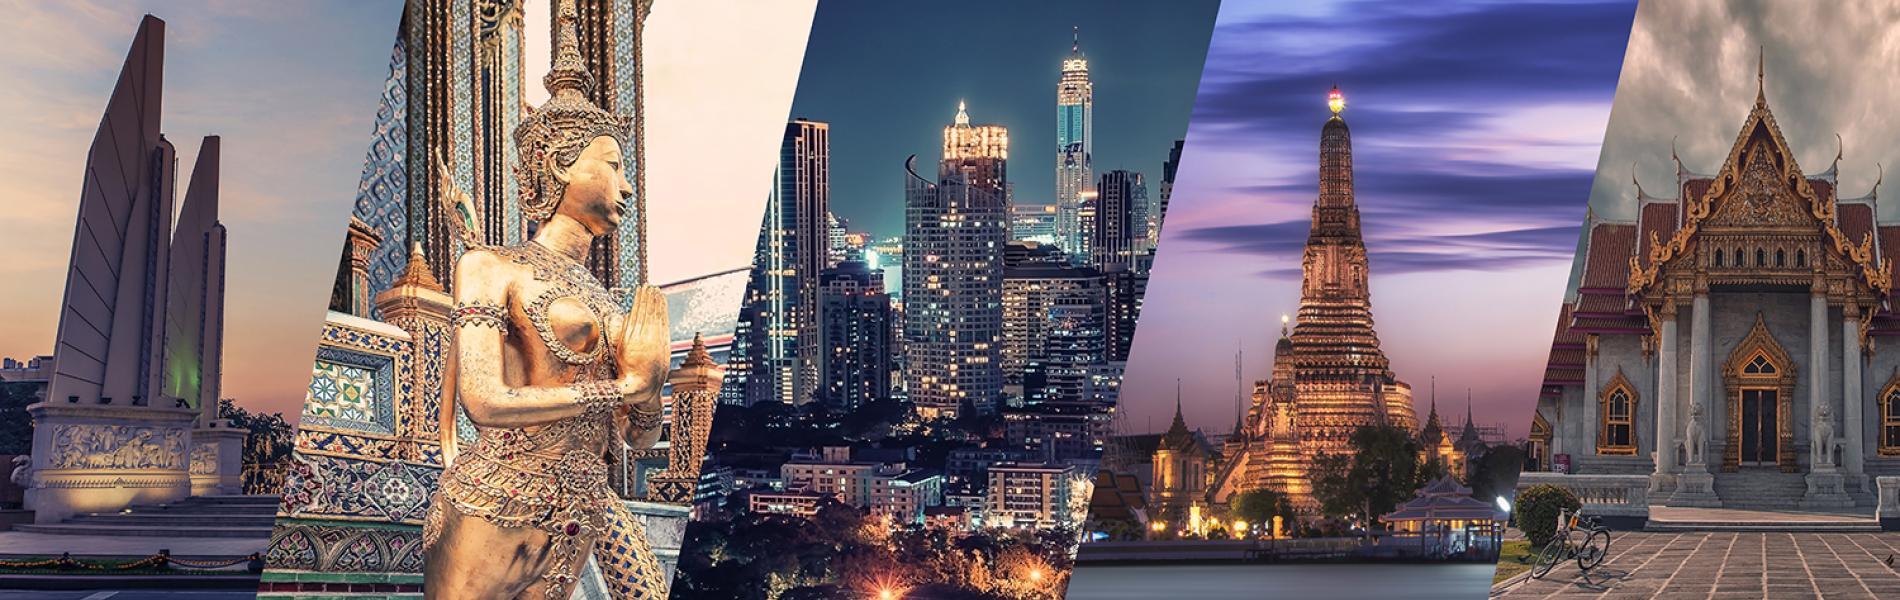 Korea Thailand Vietnam Field Studies: Business and Historical Culture